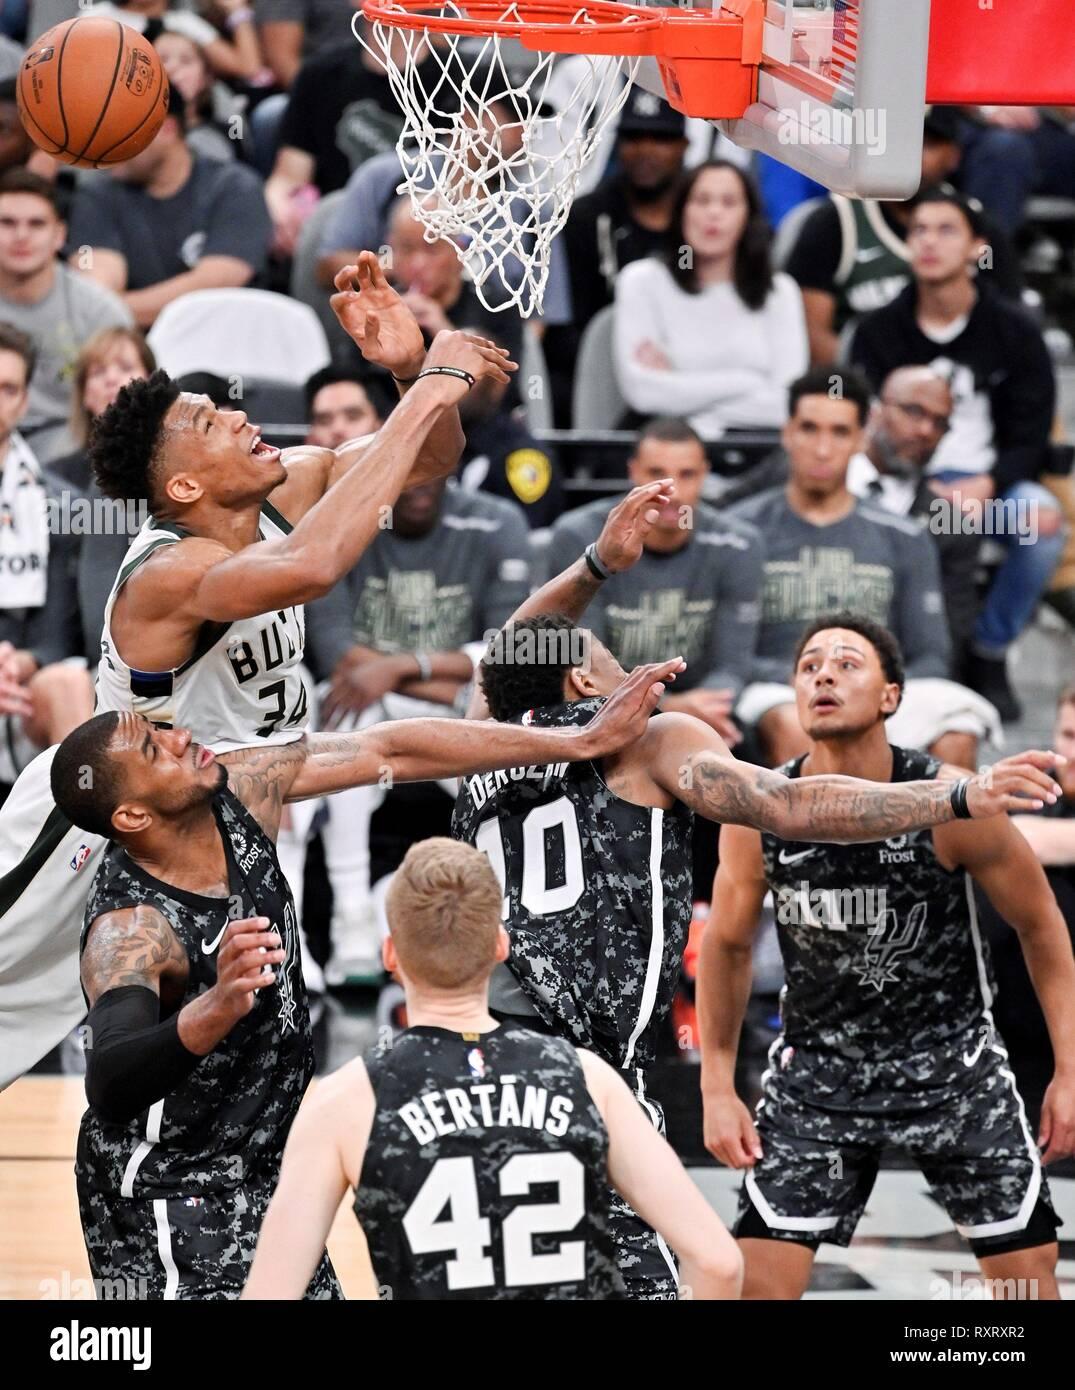 San Antonio, États-Unis. Mar 10, 2019. SAN23 SAN ANTONIO (TEXAS, Etats-Unis), 10/03/2019. Giannis Antetokounmpo - (34) de la Milwaukee Bucks tire sur LaMarcus Aldridge (L) de la San Antonio Spurs pendant un match de basket de la NBA, dimanche, 10 mars, 2019. San Antonio a gagné 121-114. Crédit: DARREN ABATE/EFE/Alamy Live News Photo Stock